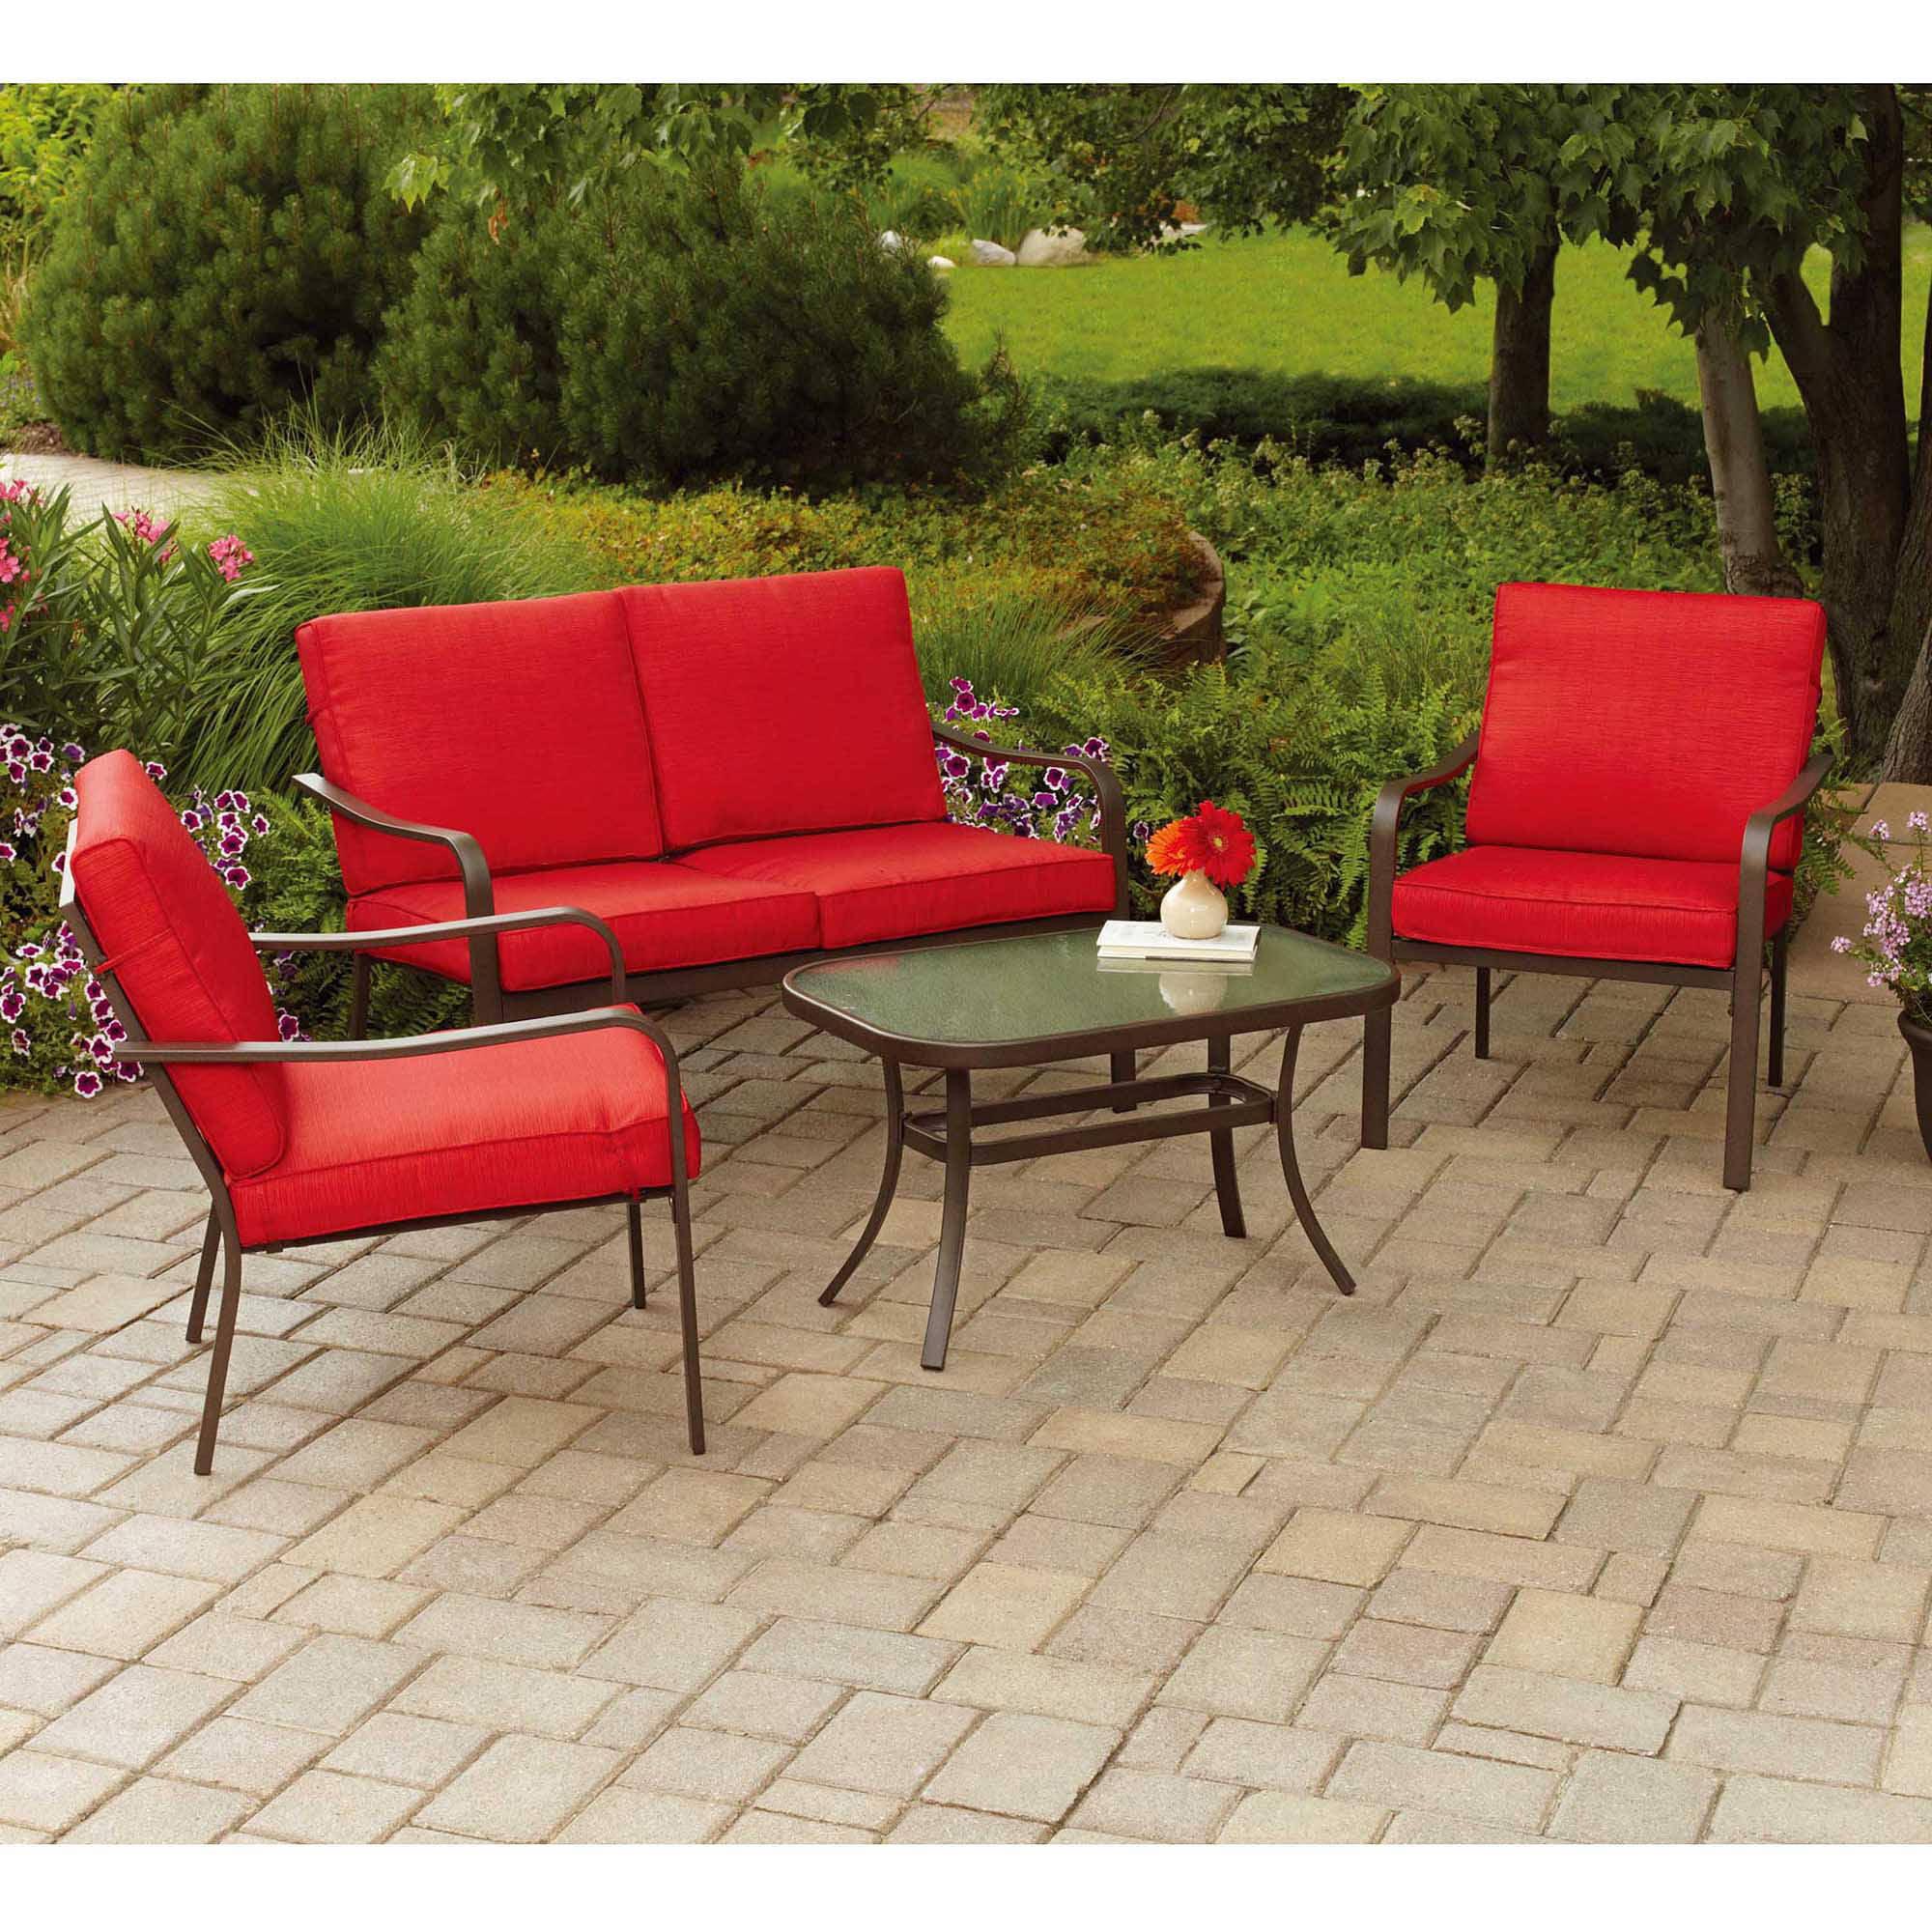 outdoor wooden folding chairs walmart com